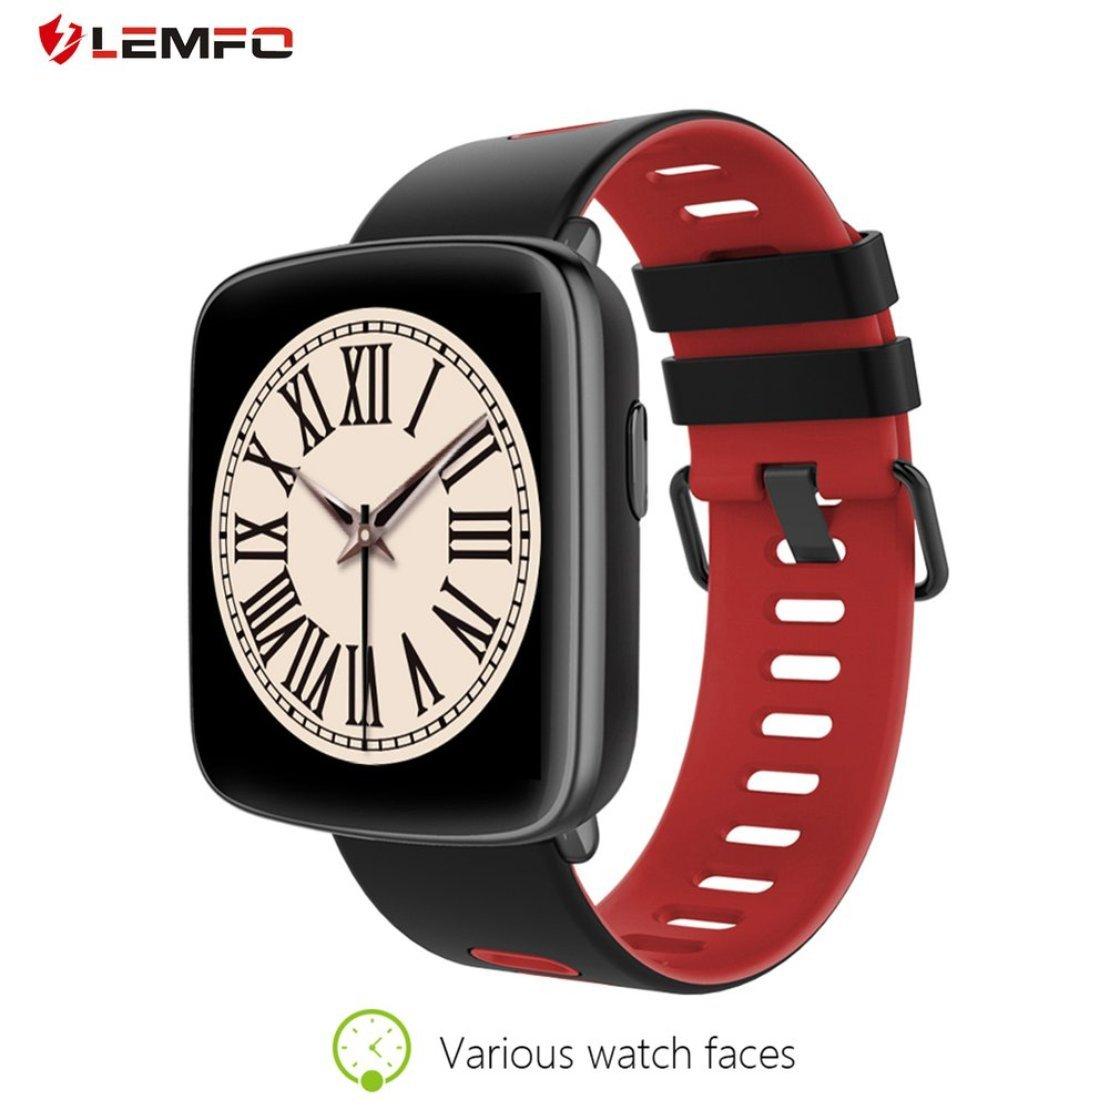 Amazon.com: LEMFO GV68 Smart Watch Waterproof Heart Rate ...